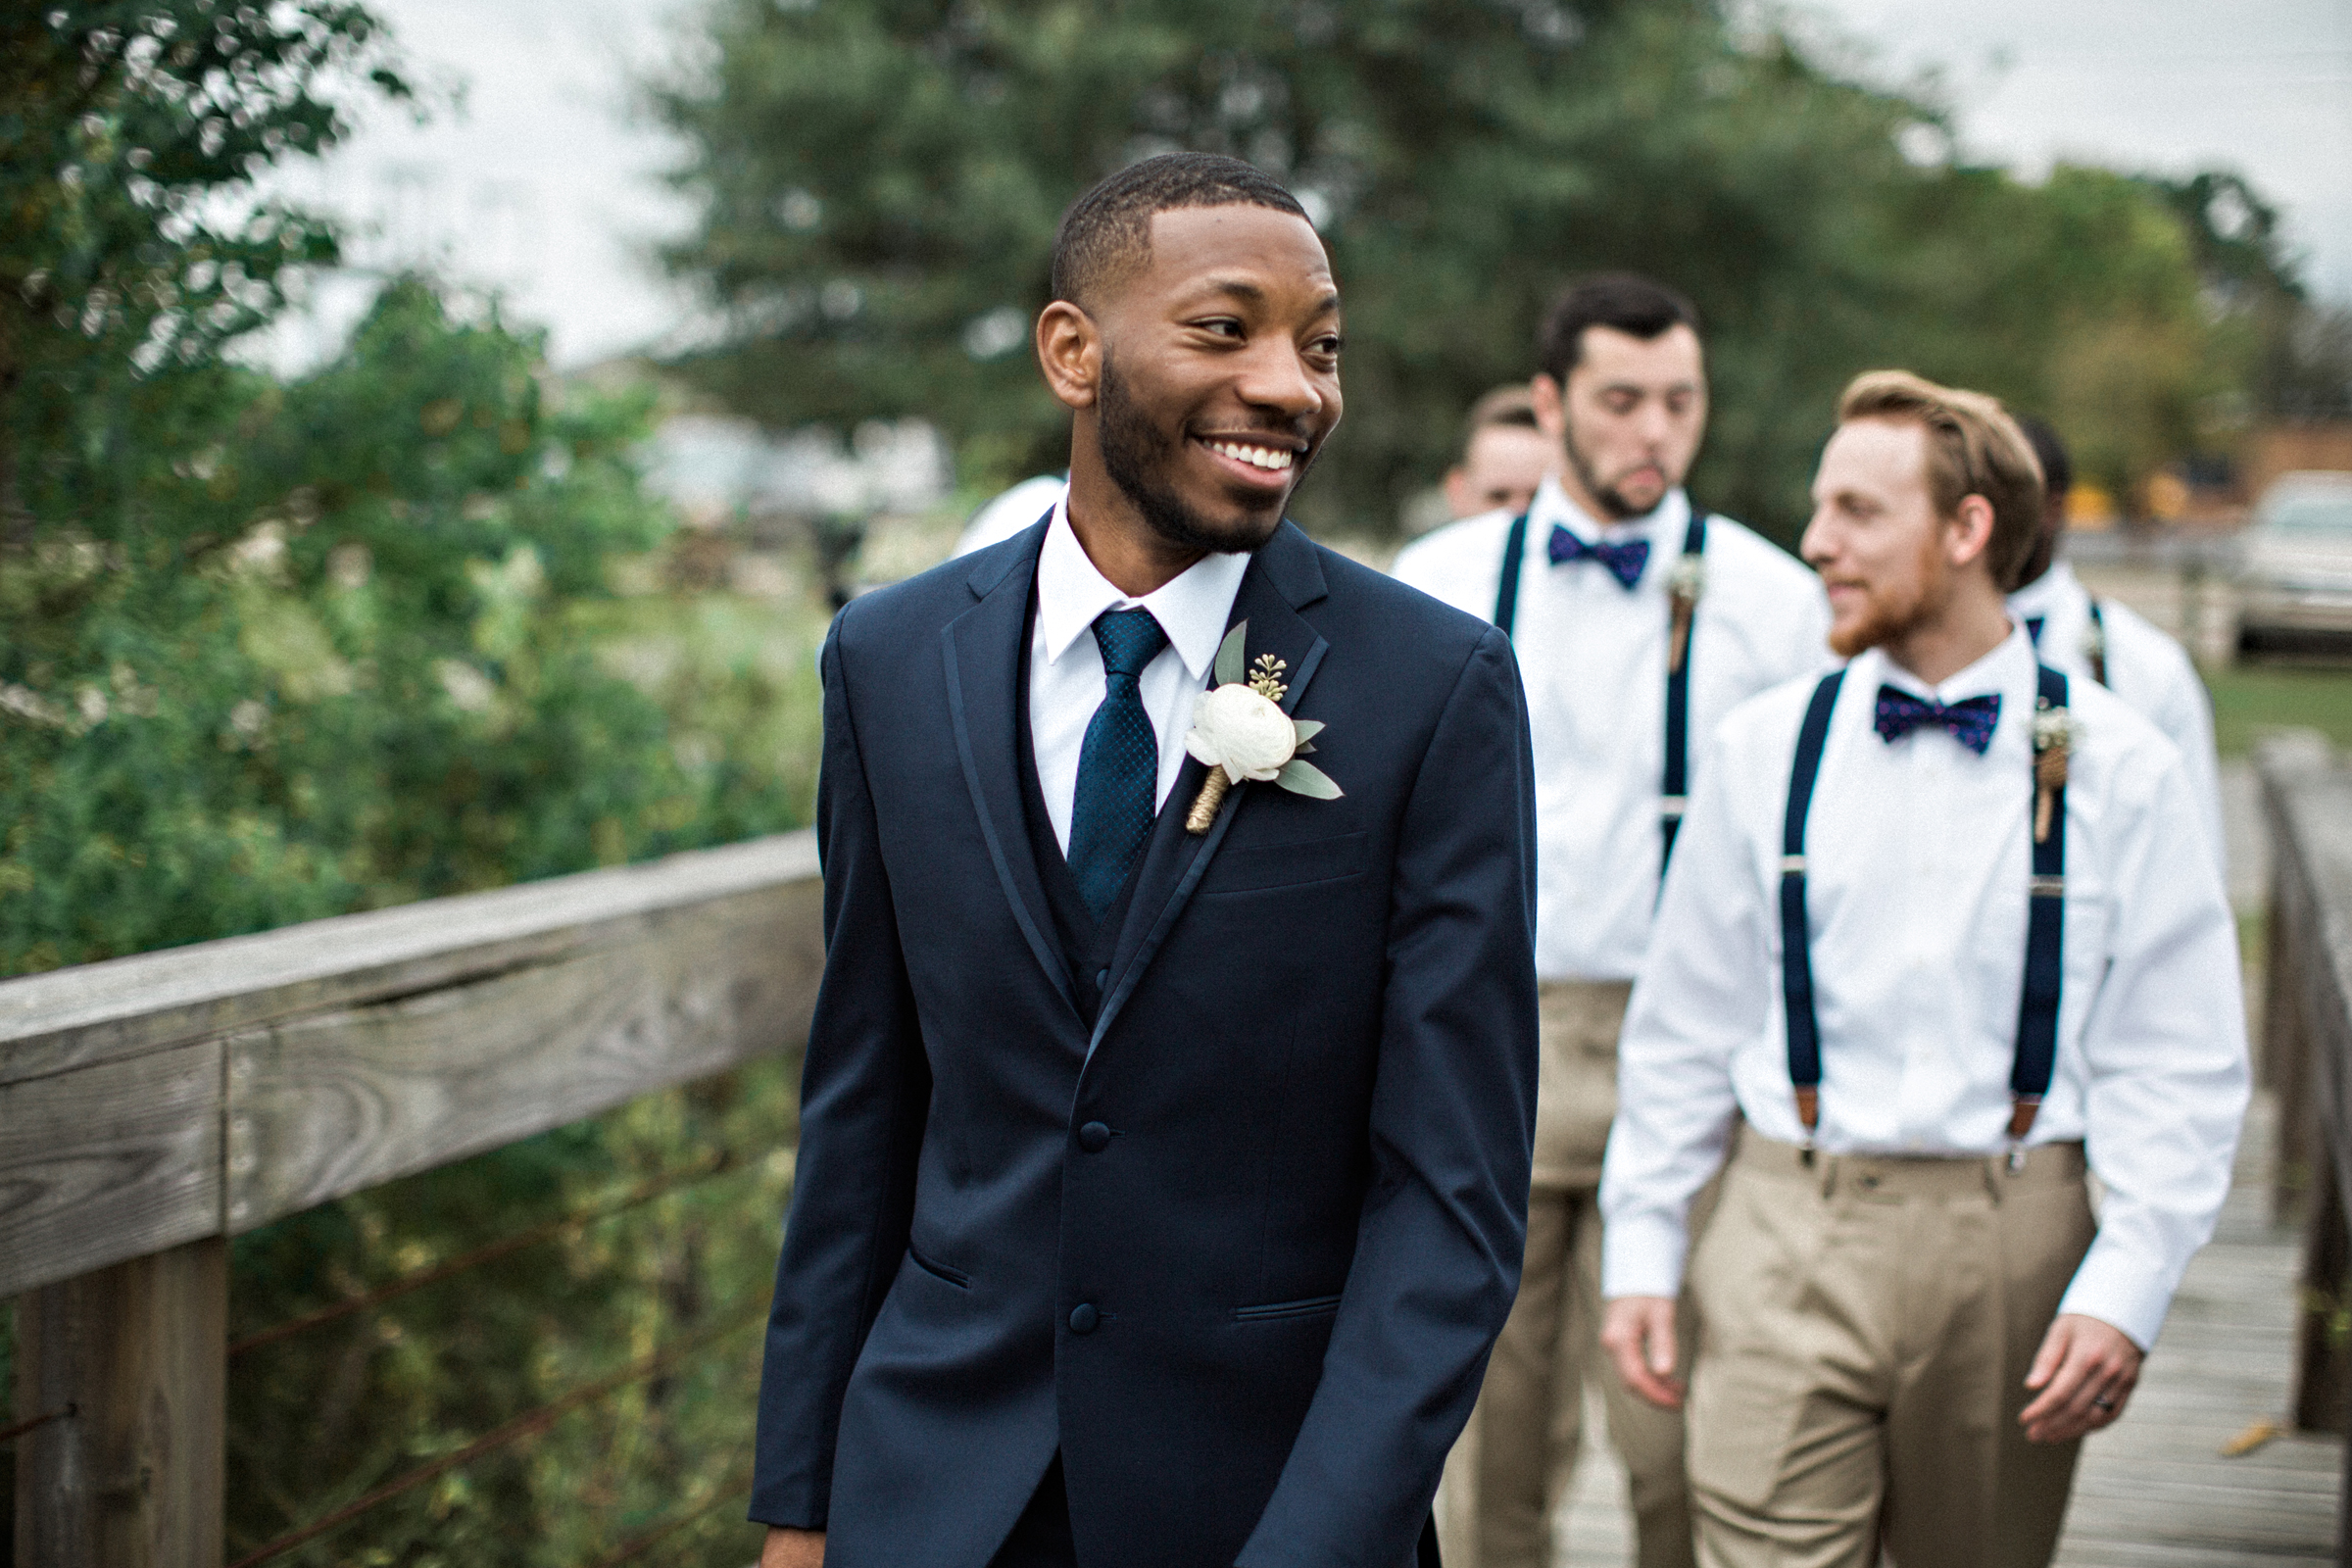 Alabama-Wedding-Photography-Nick-Drollette-Cory-Laura-100.jpg